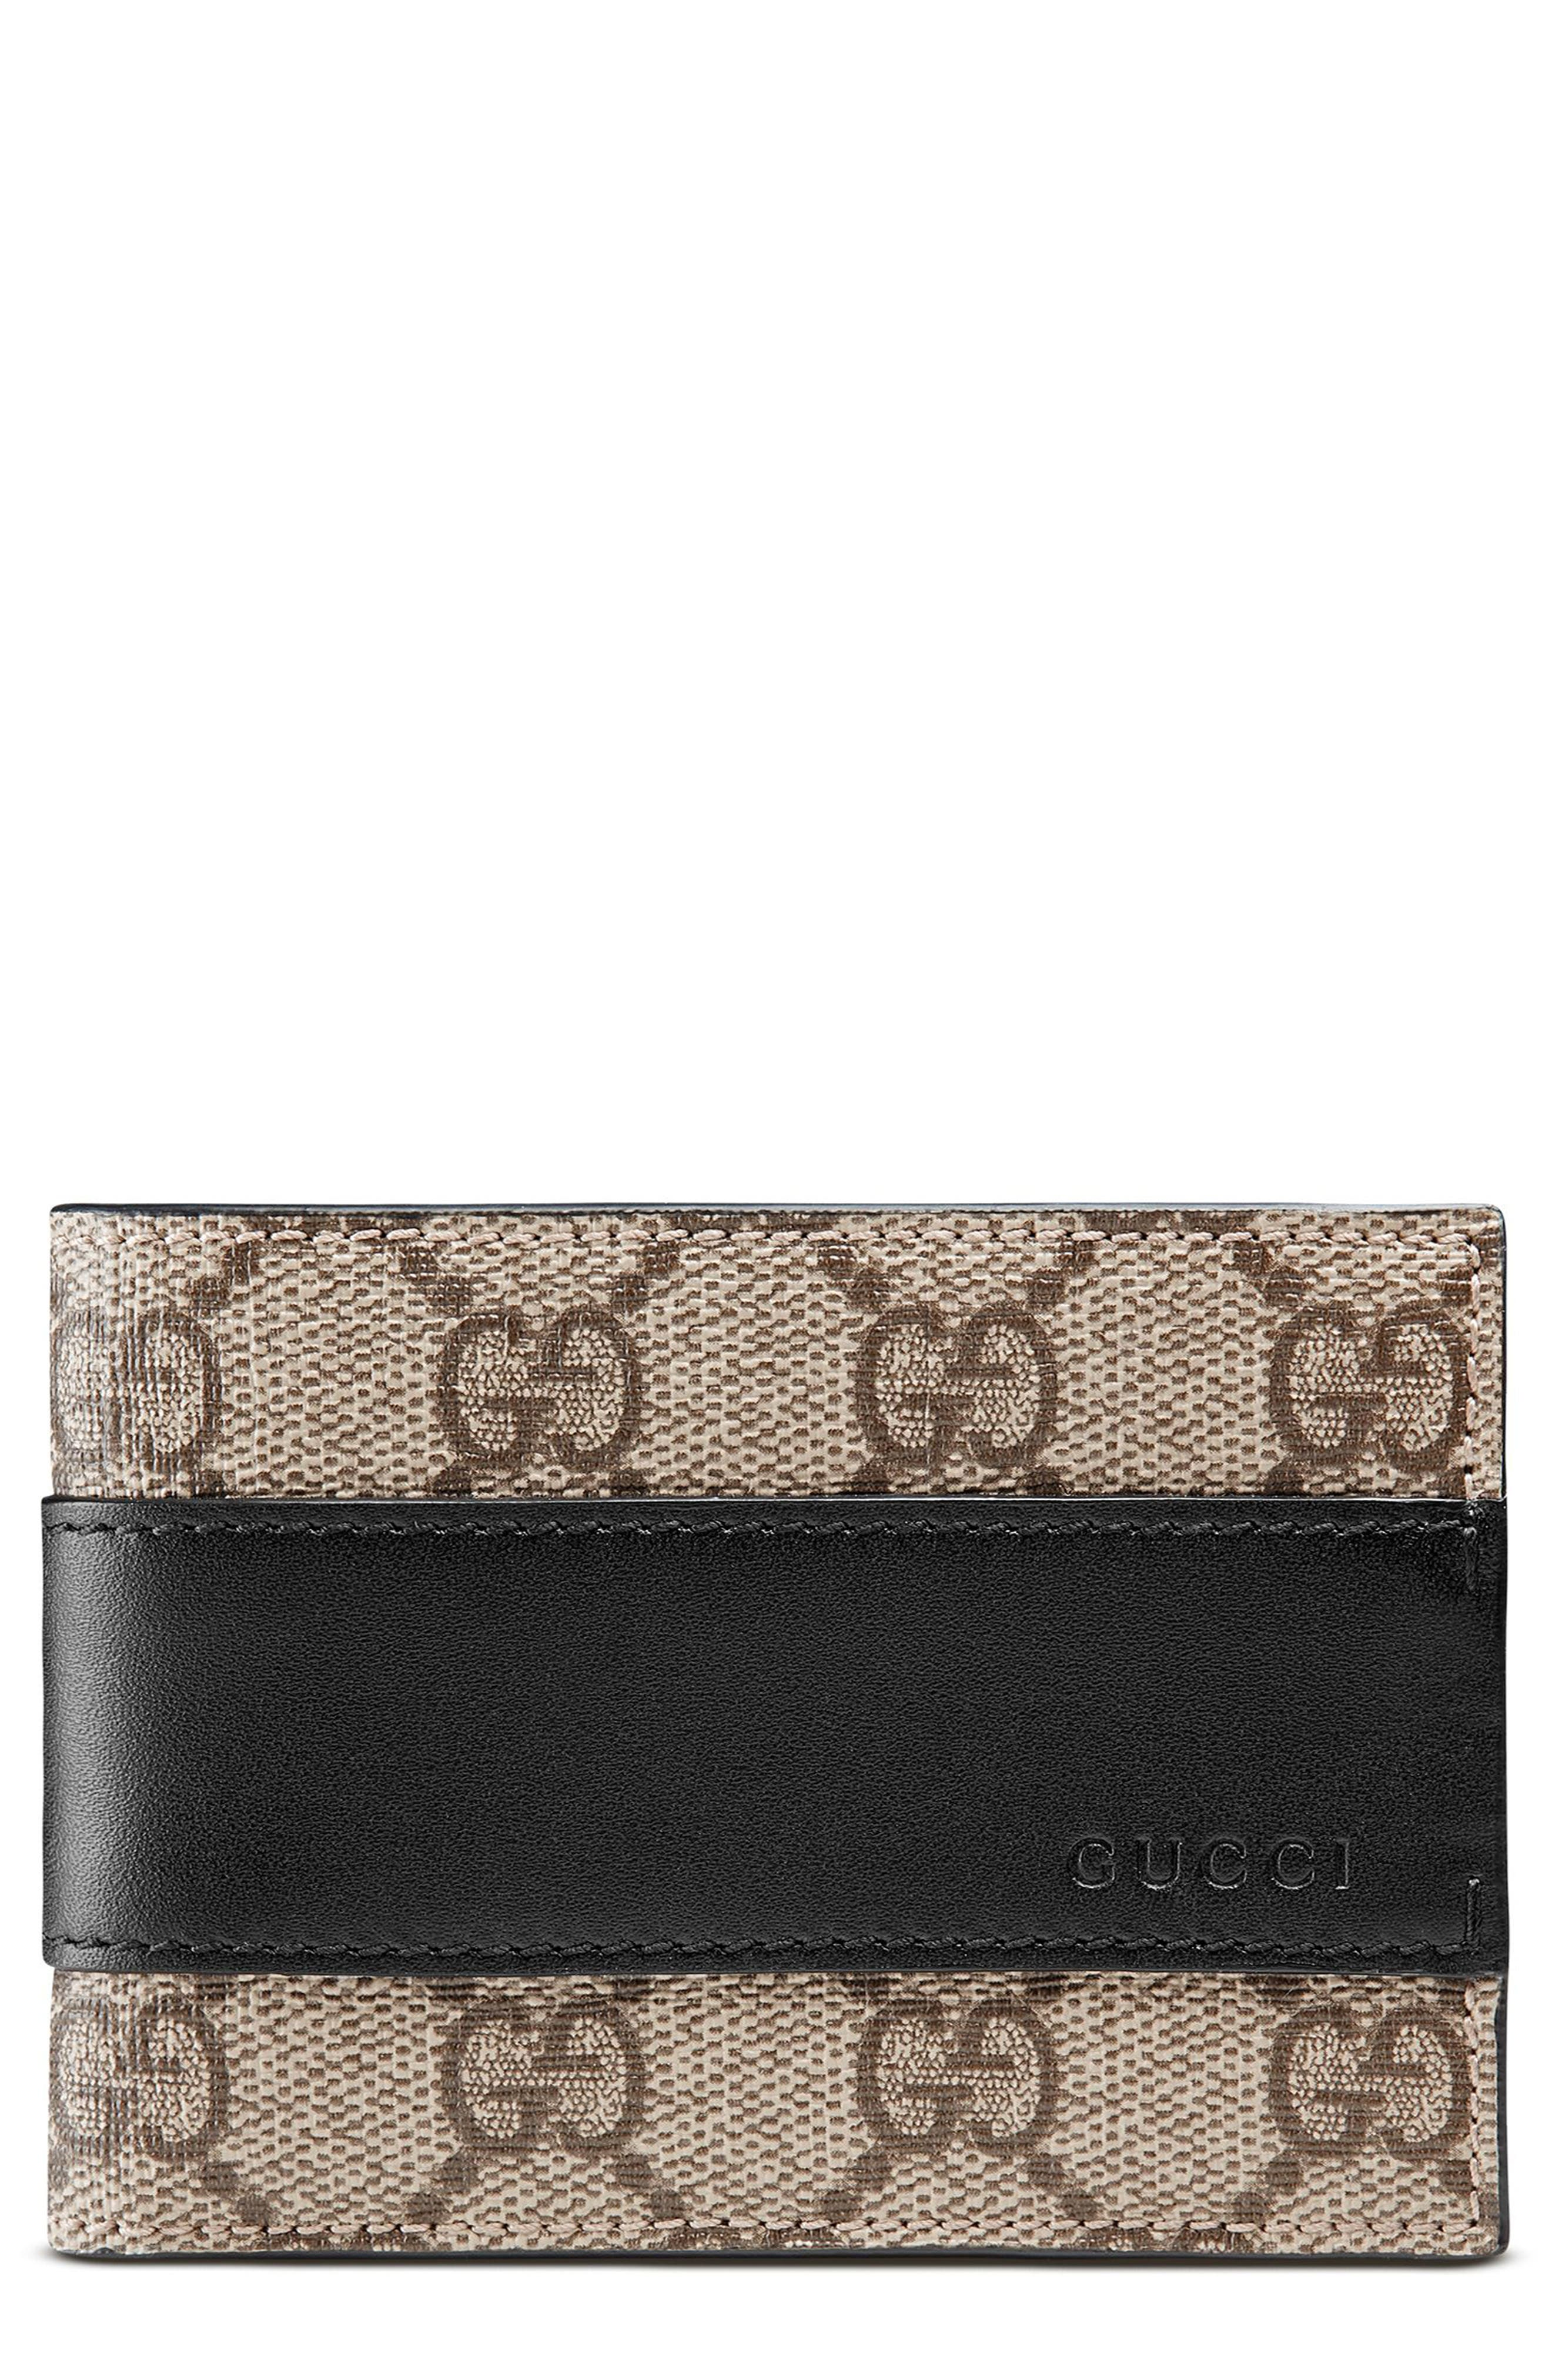 Gucci GG Supreme Canvas Wallet